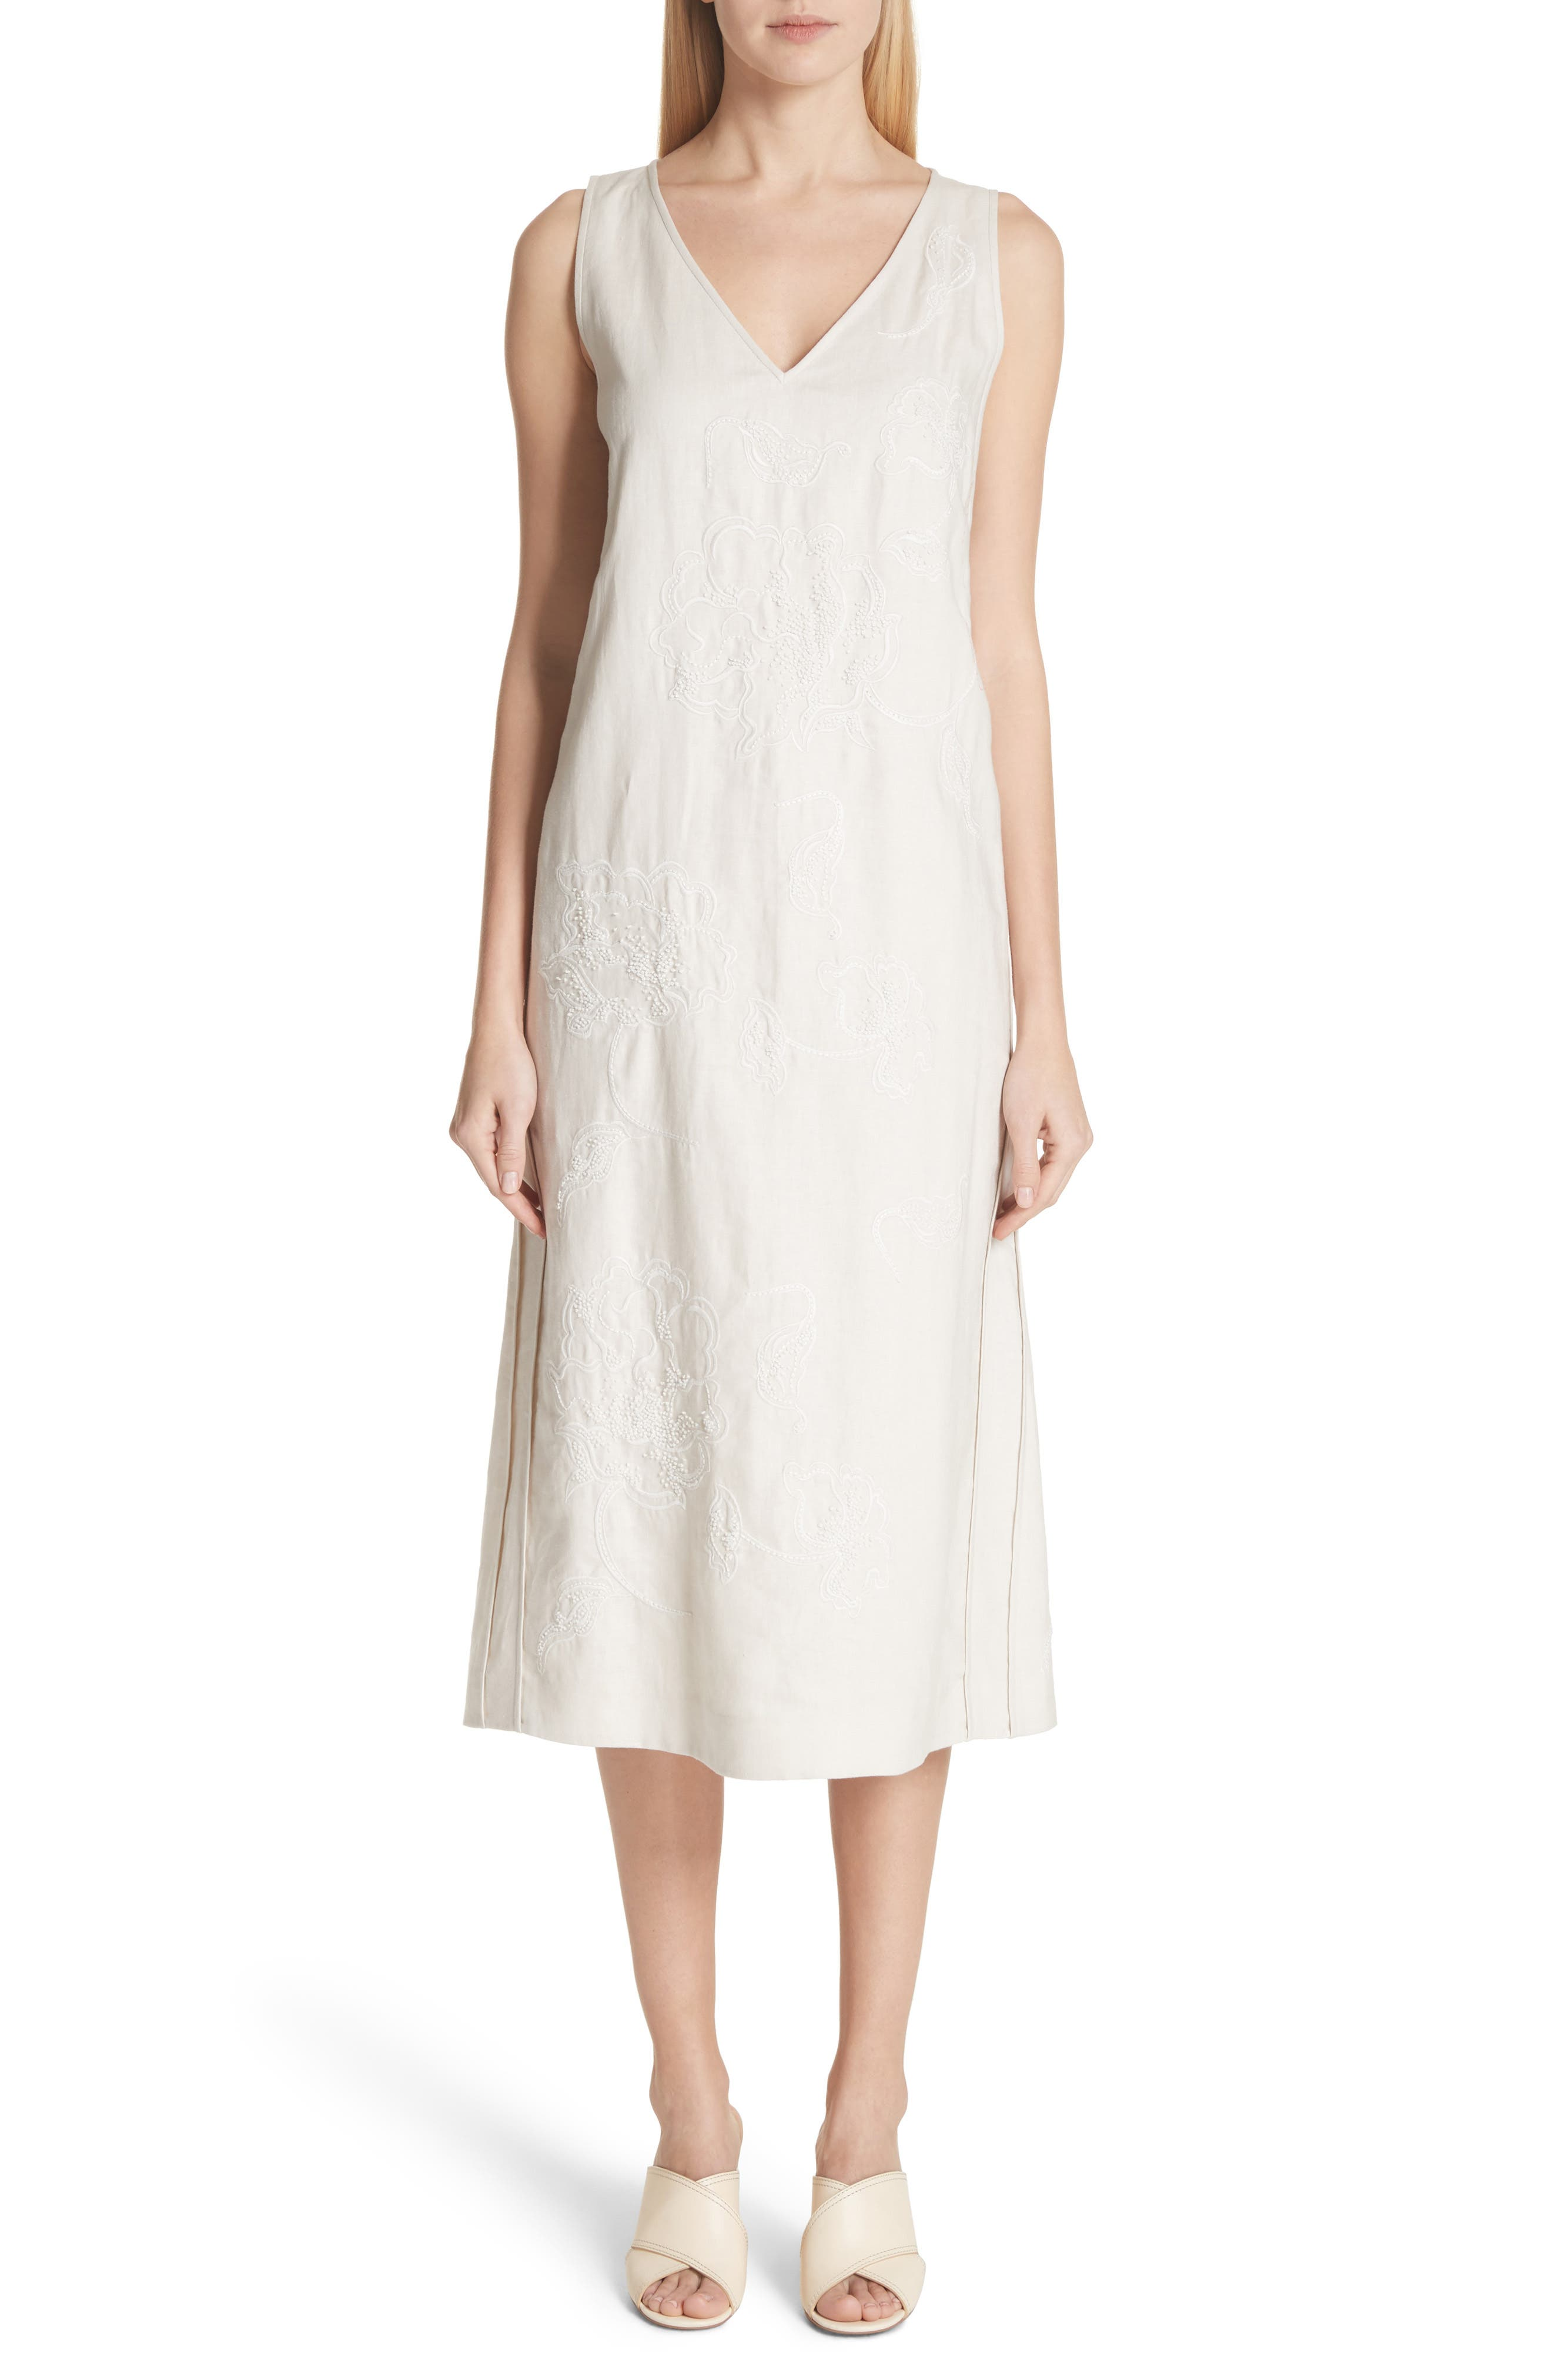 Duncan Embroidered Linen Dress,                         Main,                         color, Raffia